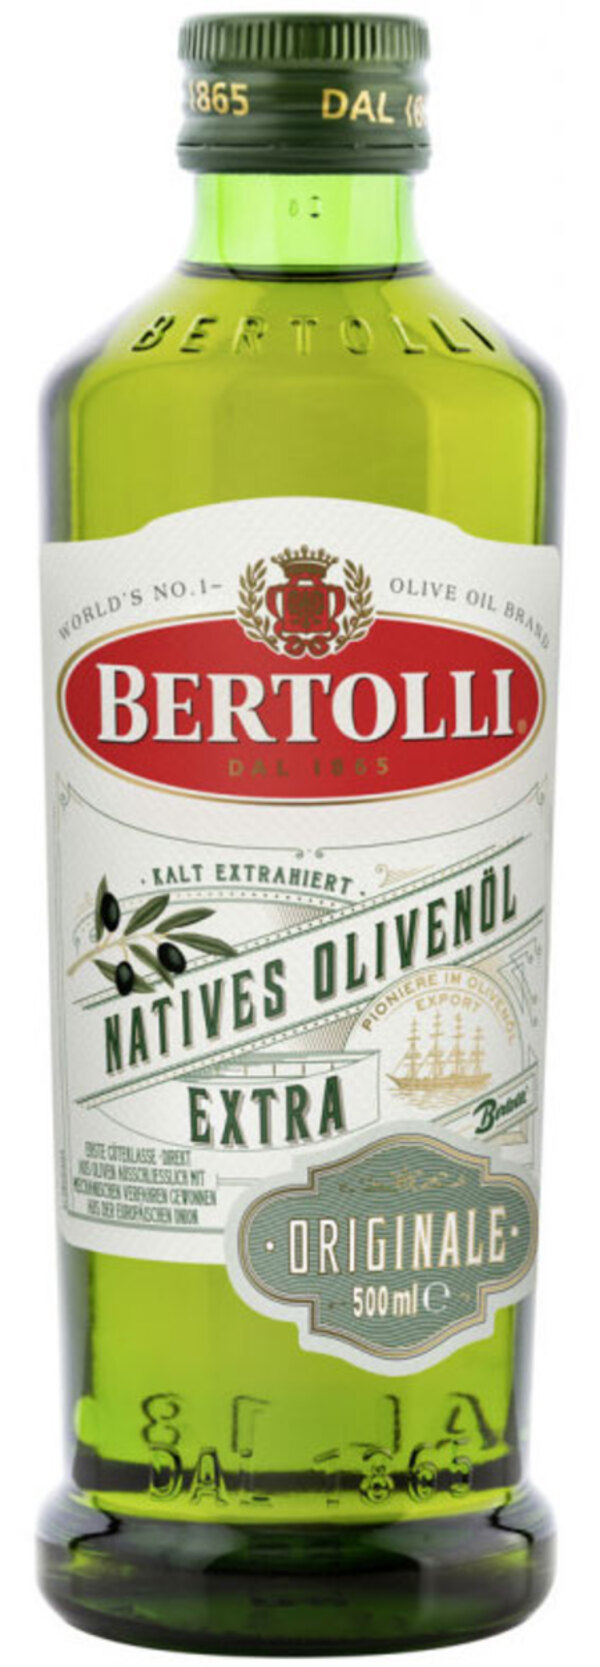 Bertolli Natives Olivenöl Extra Originale 500 ml